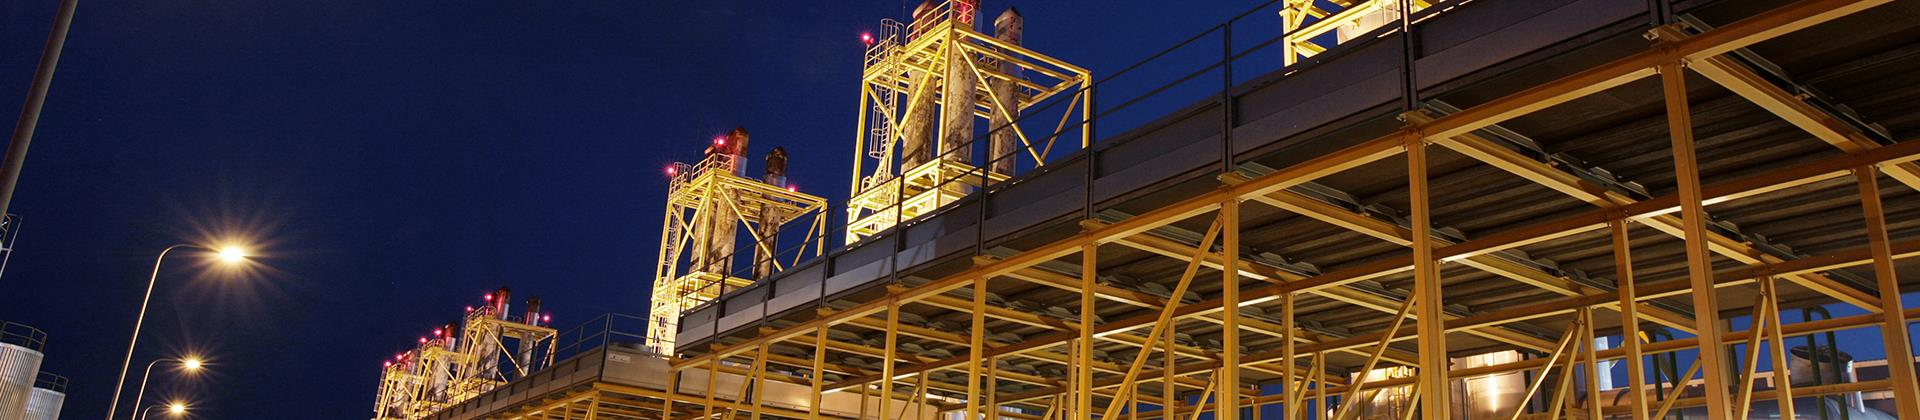 Gas conversion power plants